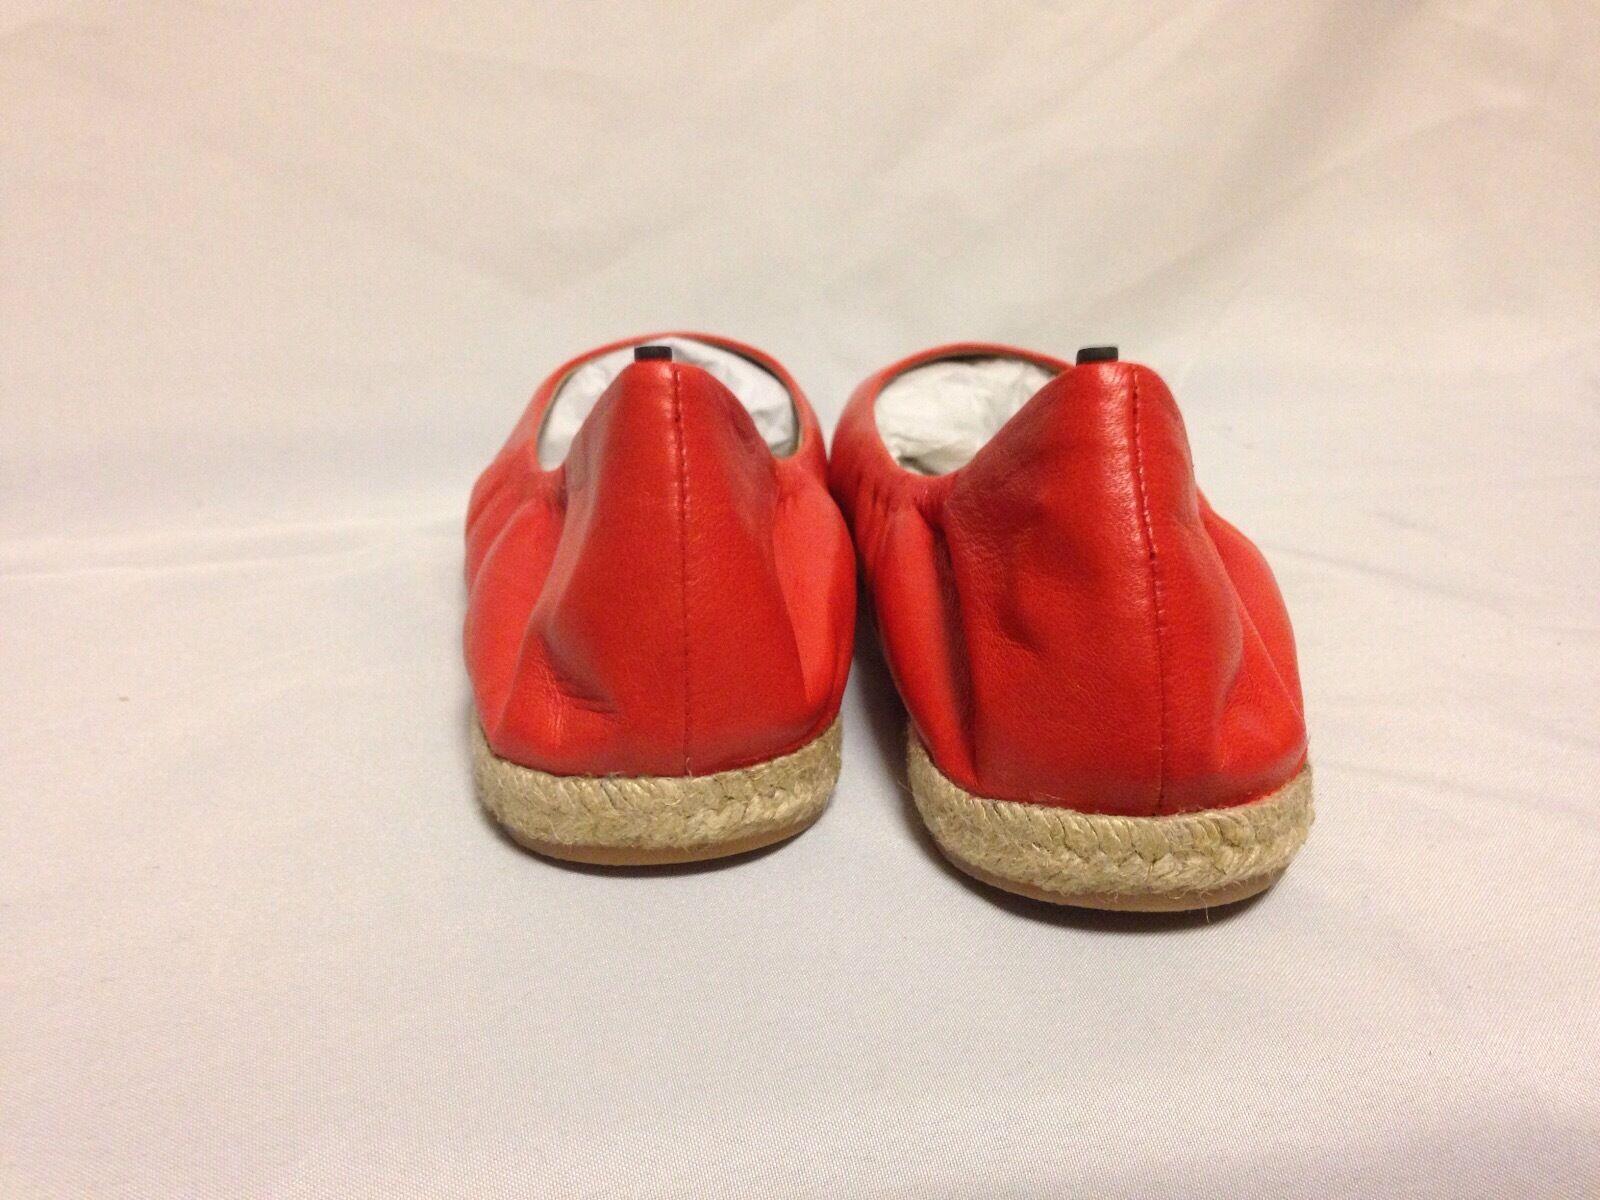 Via Spiga Arnelia Ballet Flat 10 10 Flat M Clementine  New w/ Box e16159